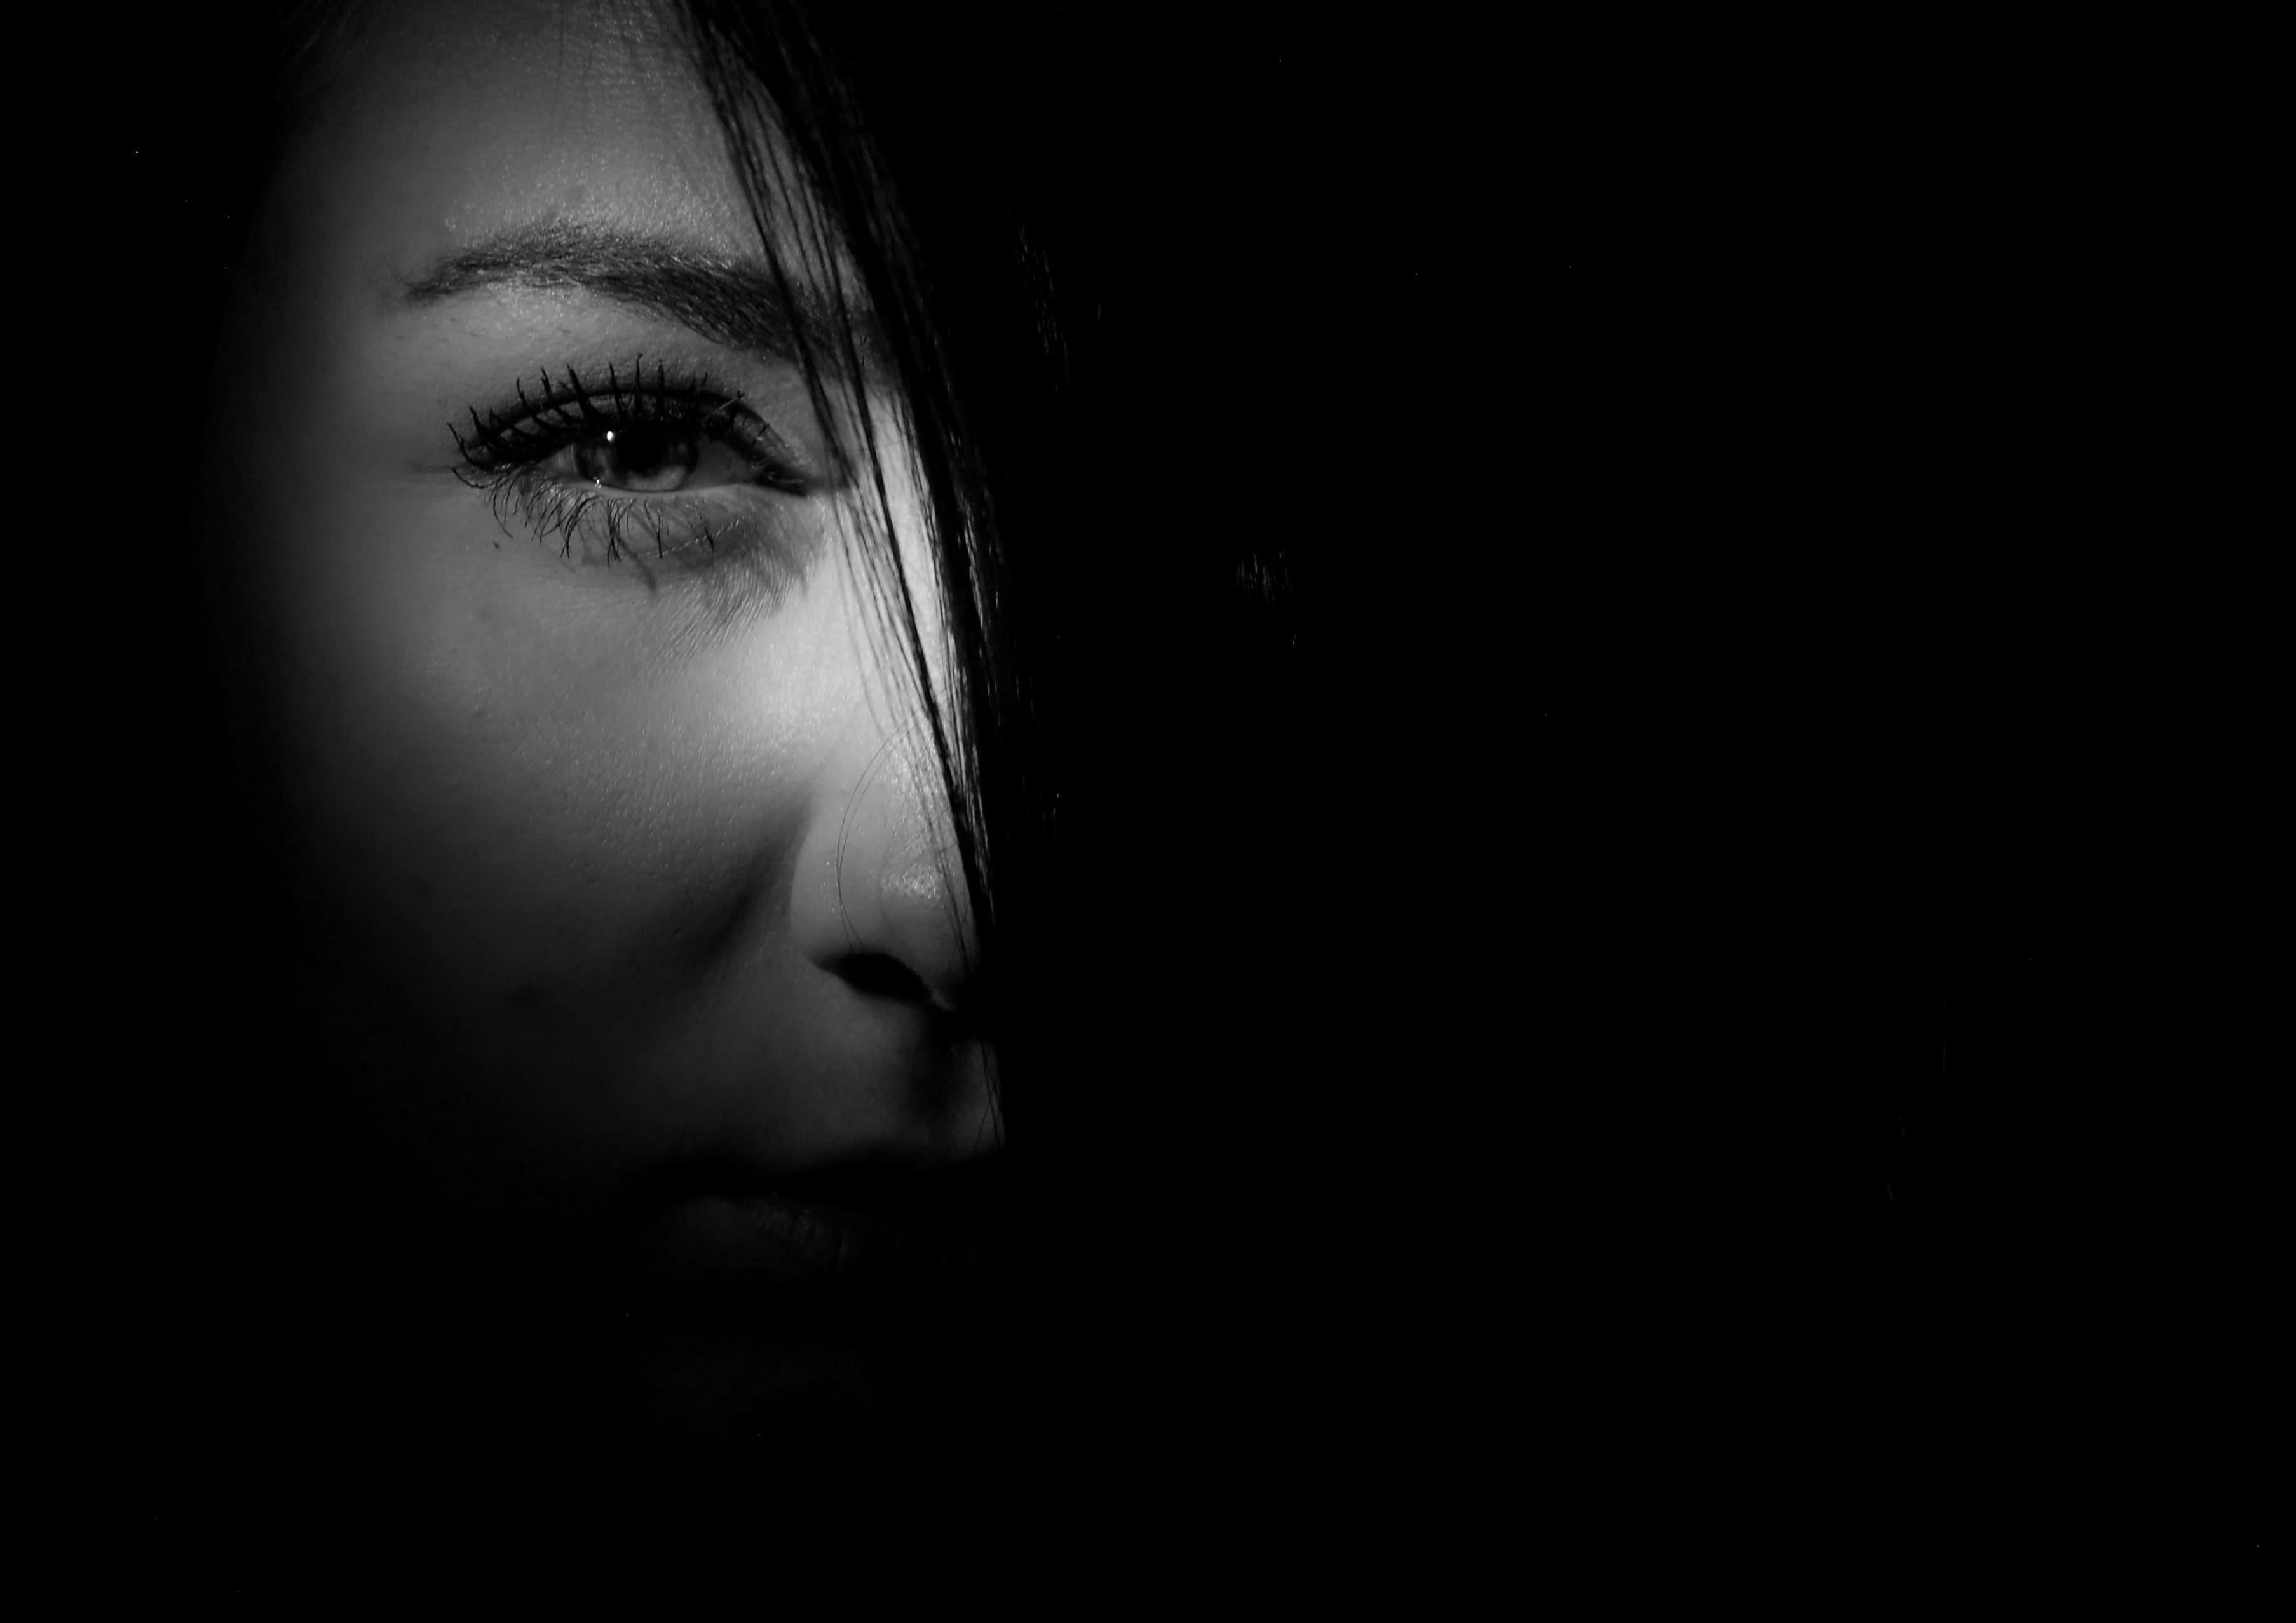 Women with eye emergency